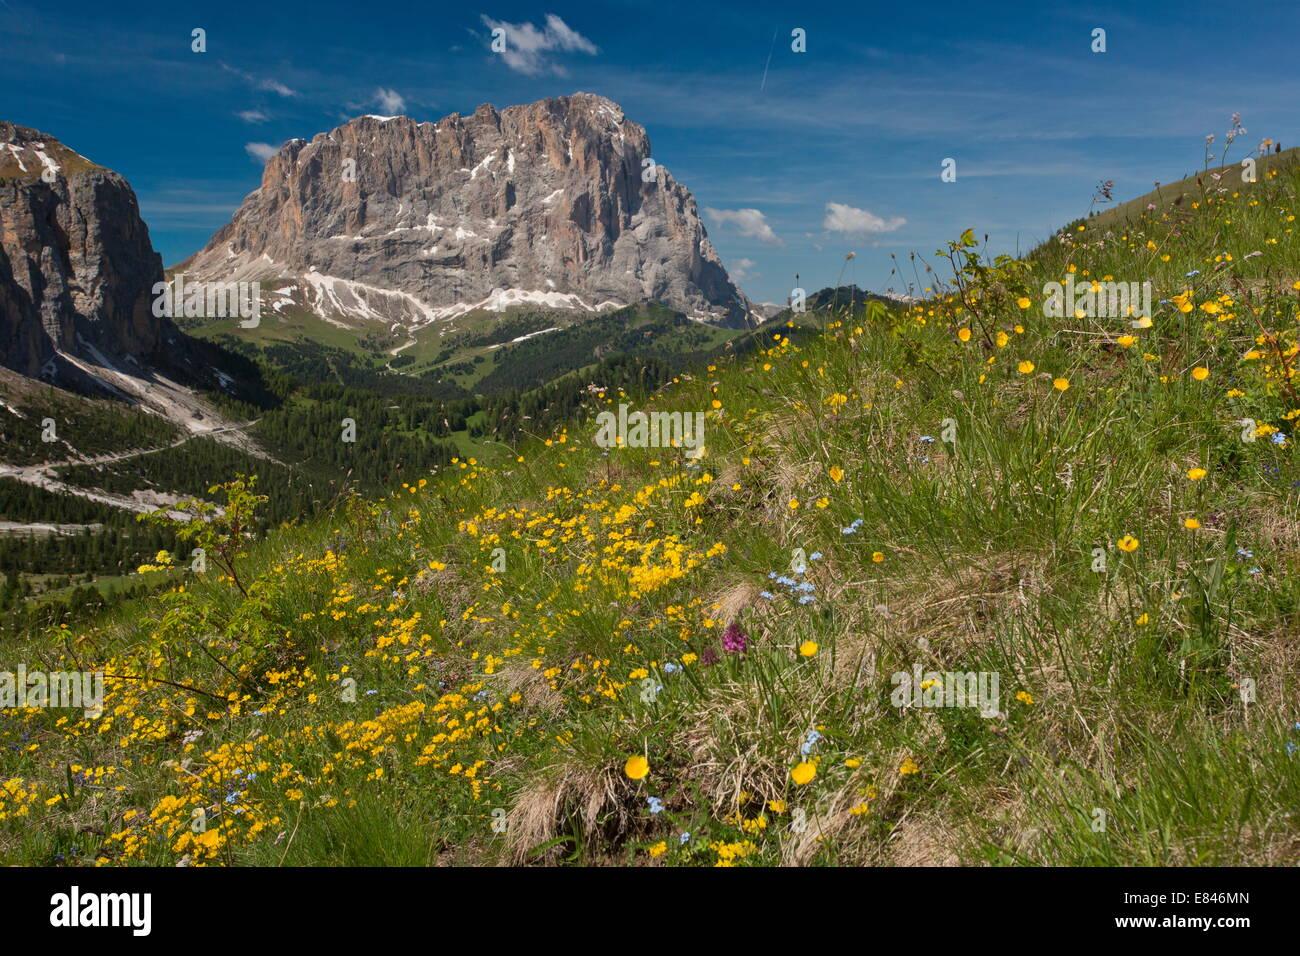 Alpine flowers at 2200m on the Gardena Pass, Dolomites, Italy - Stock Image